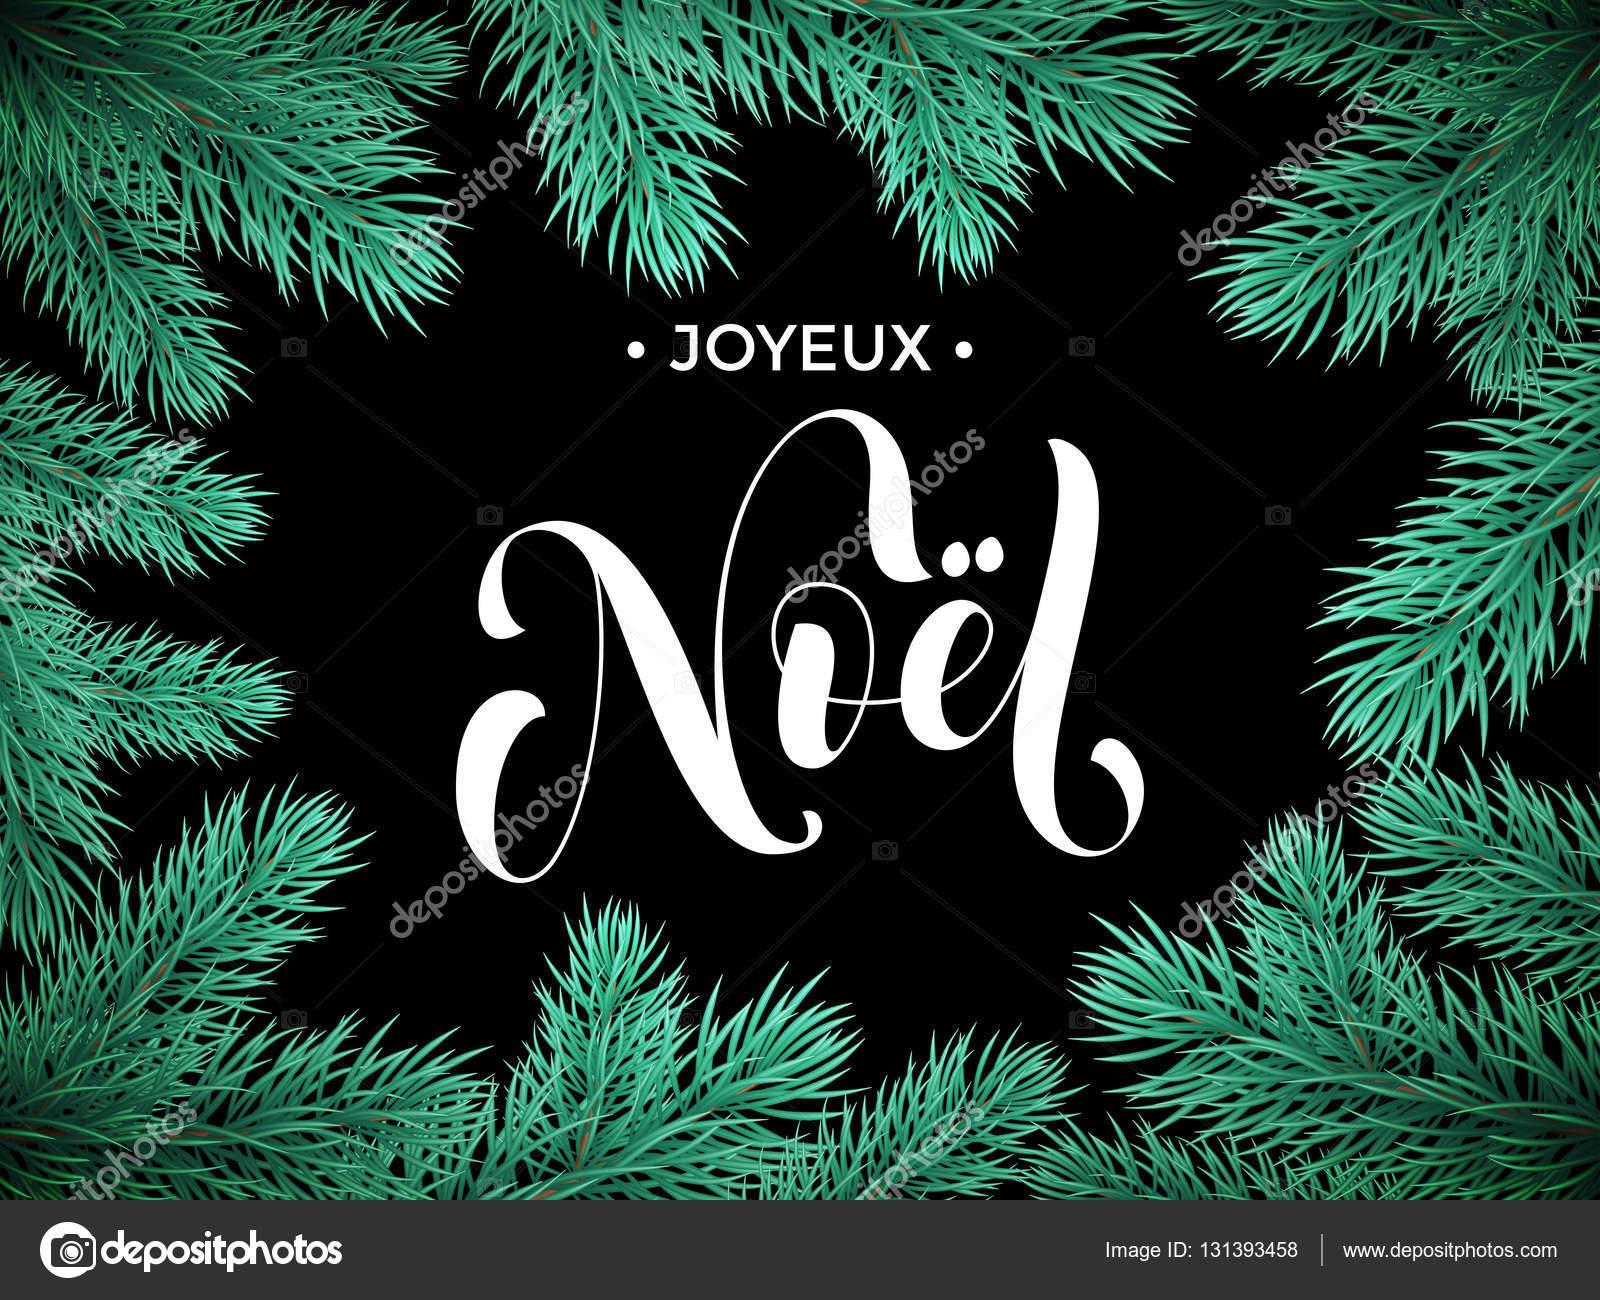 Auguri Di Buon Natale Francese.Cartolina D Auguri Di Buon Natale Di Joyeux Noel Francese